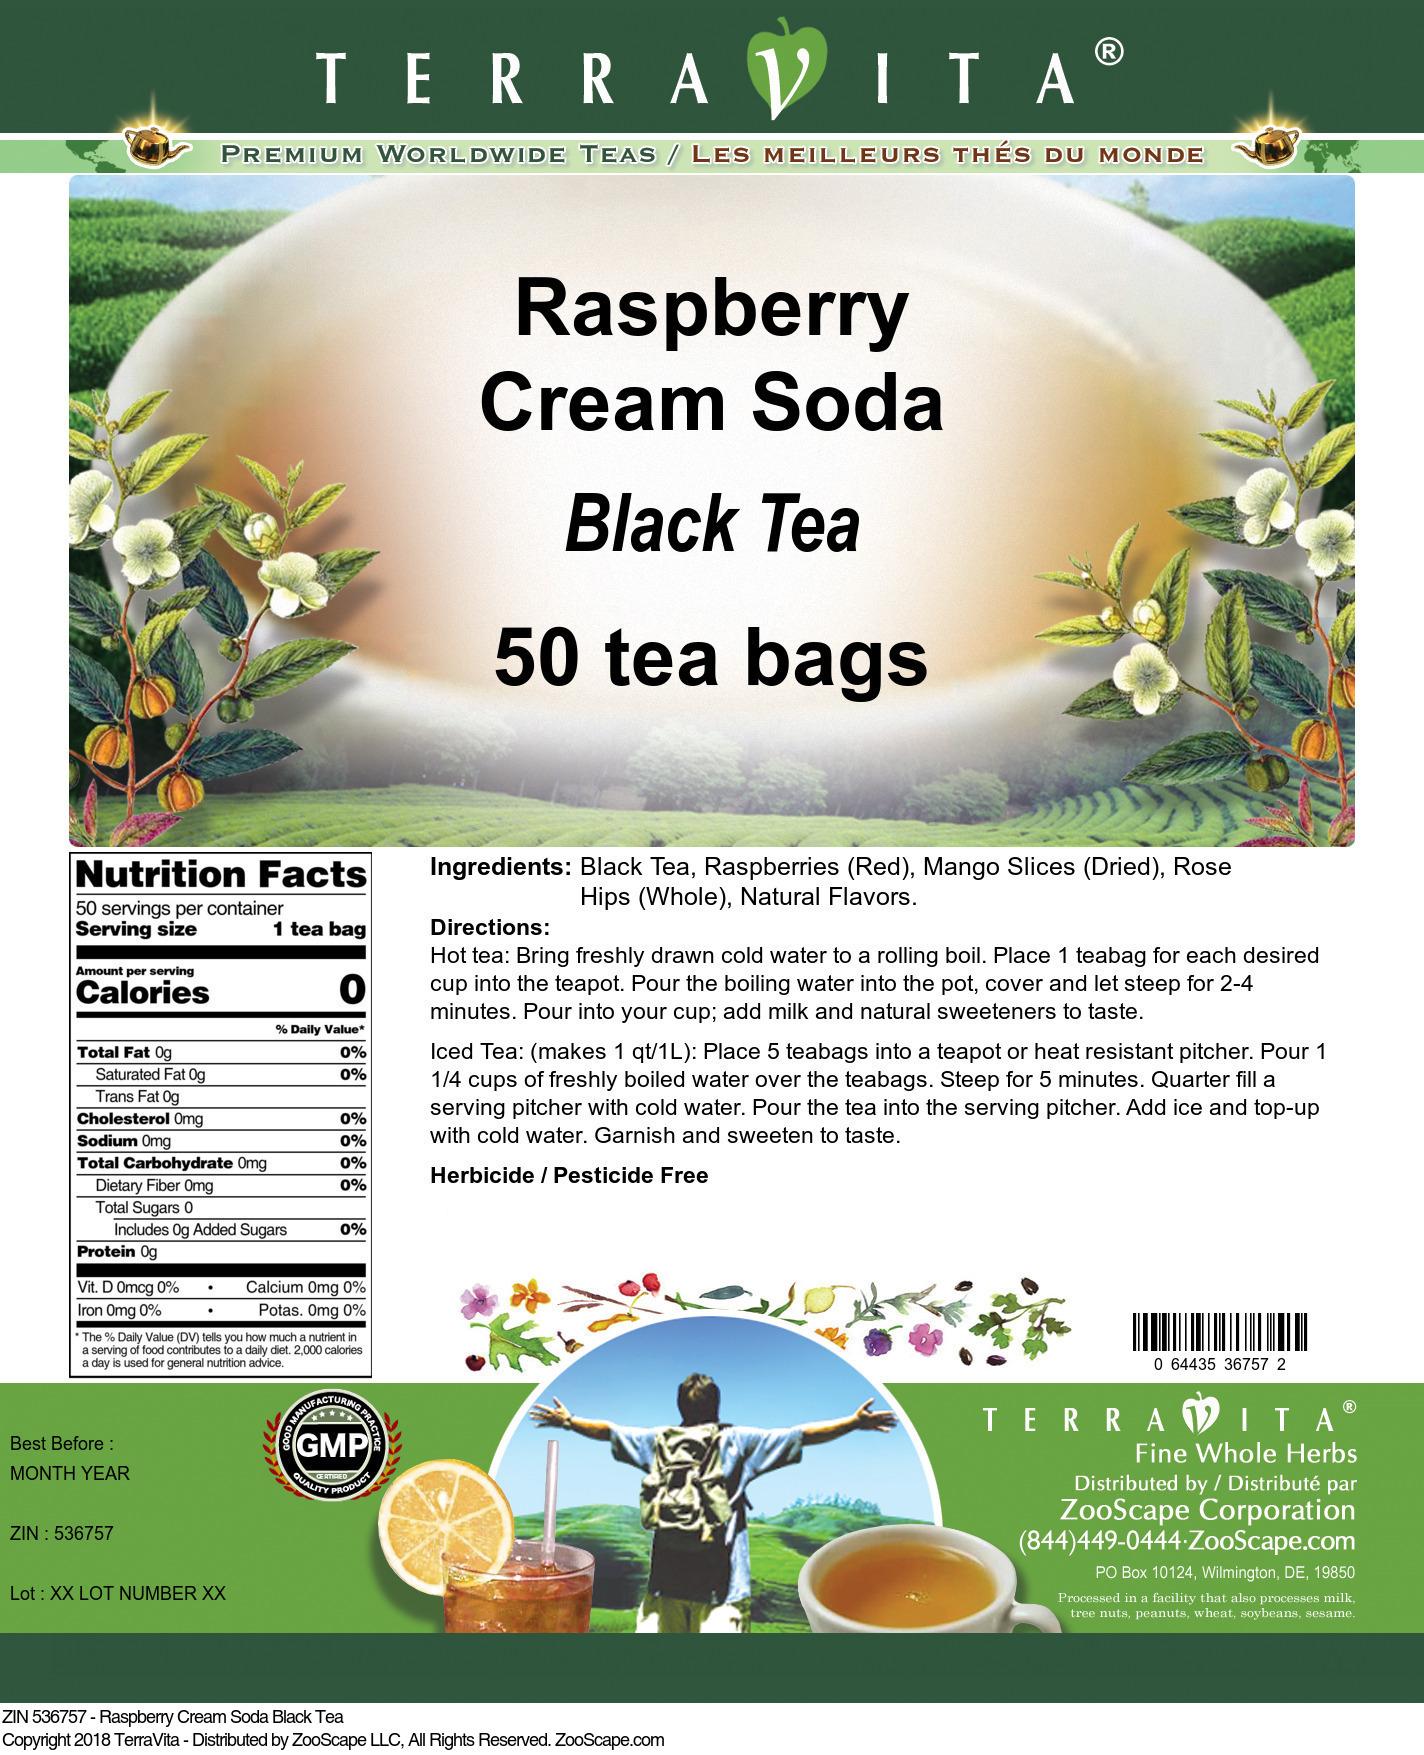 Raspberry Cream Soda Black Tea